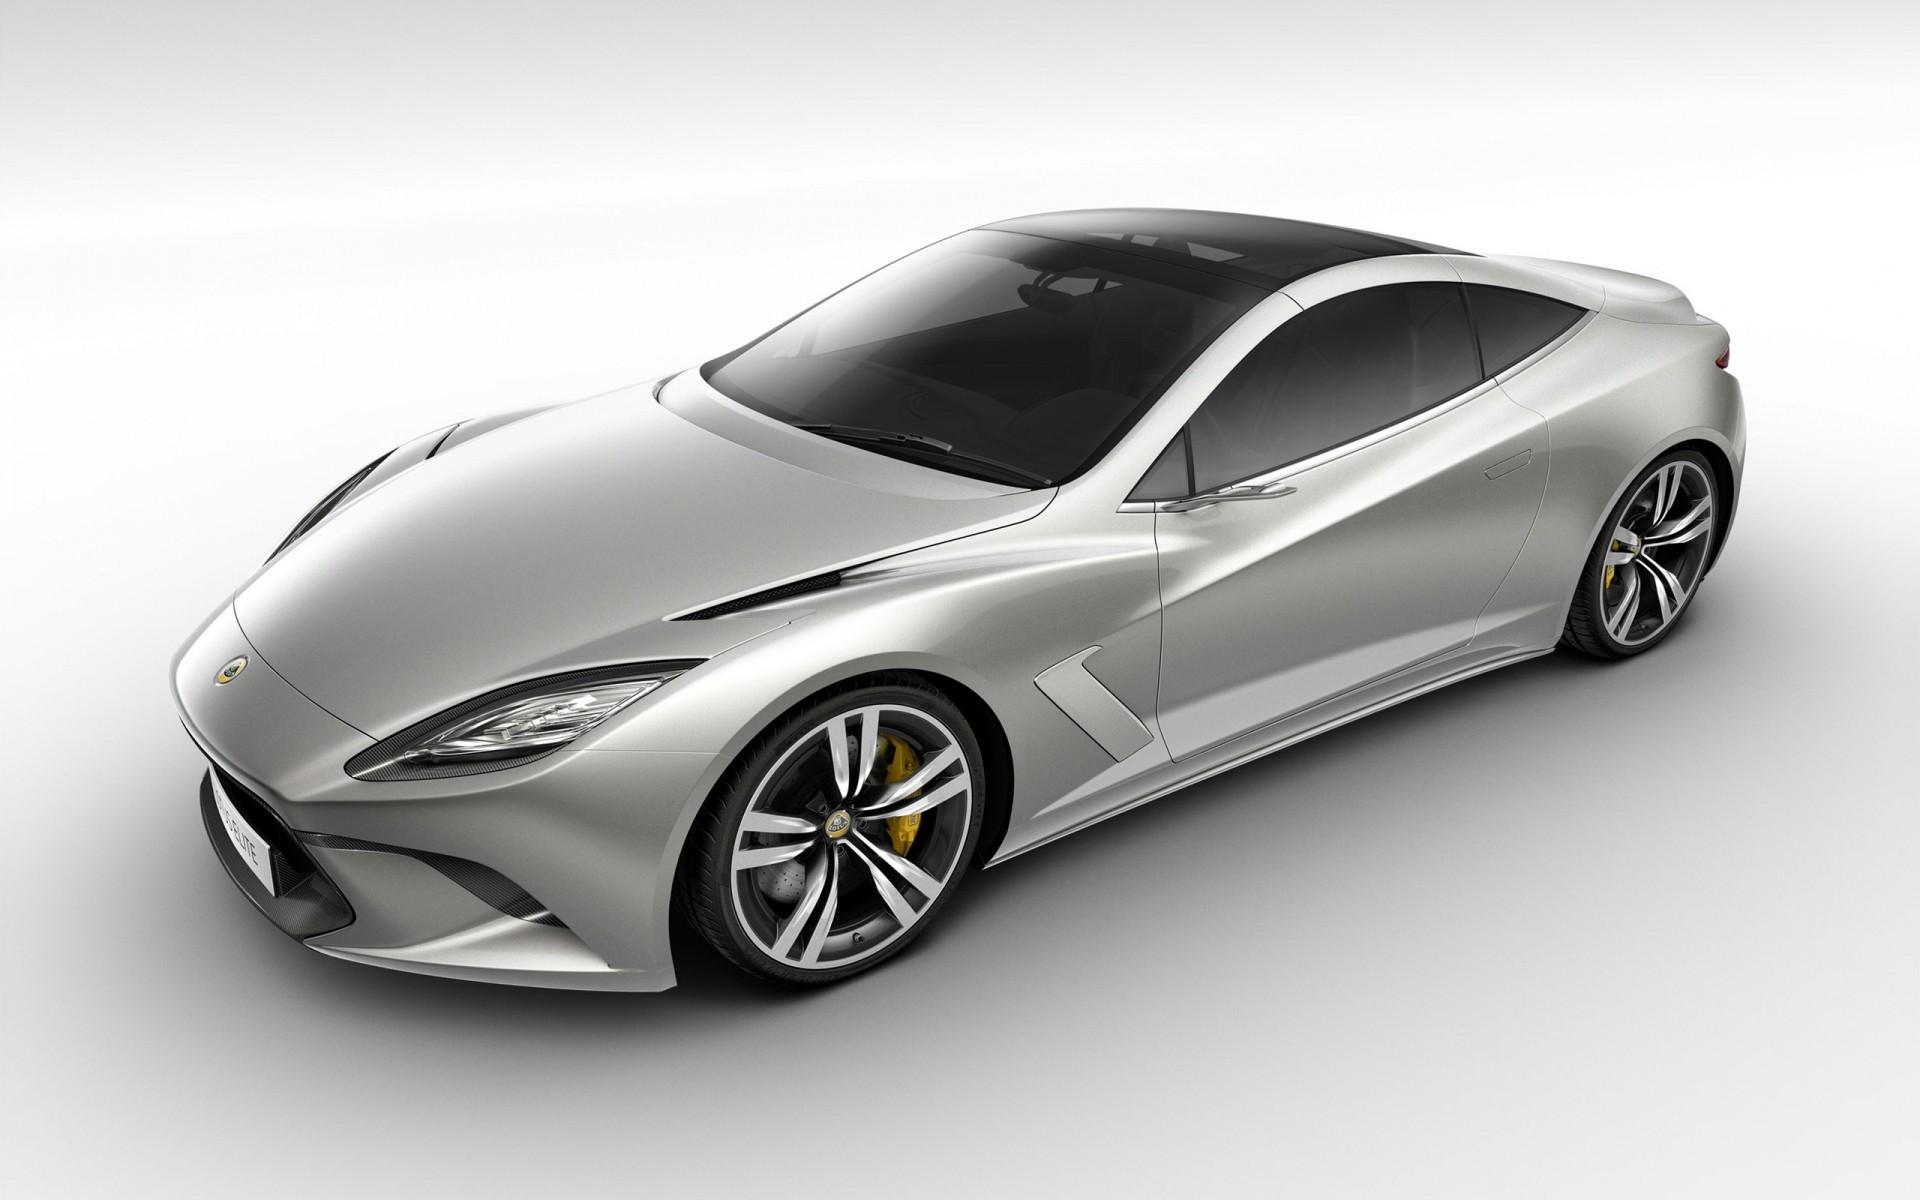 Lotus Car Wheel Vehicle Fast Automotive Coupe Transportation System Drive  Chrome Sedan Speed Classic Lotus Elite